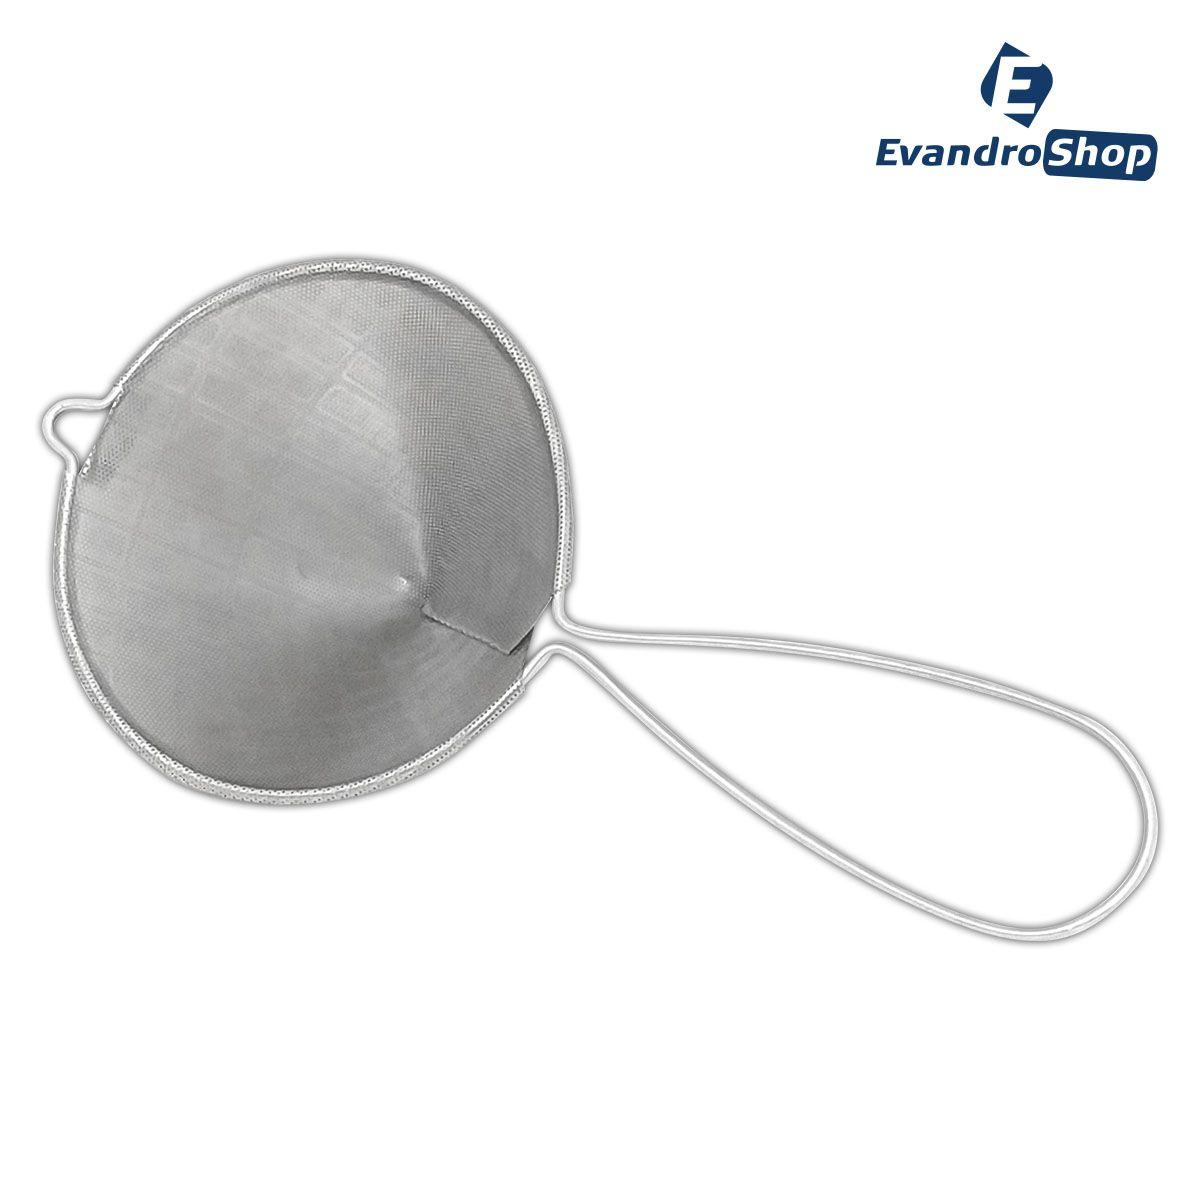 Coador Tipo Funil Aço Inox 304 Perfurado 17x13 - Frigopro